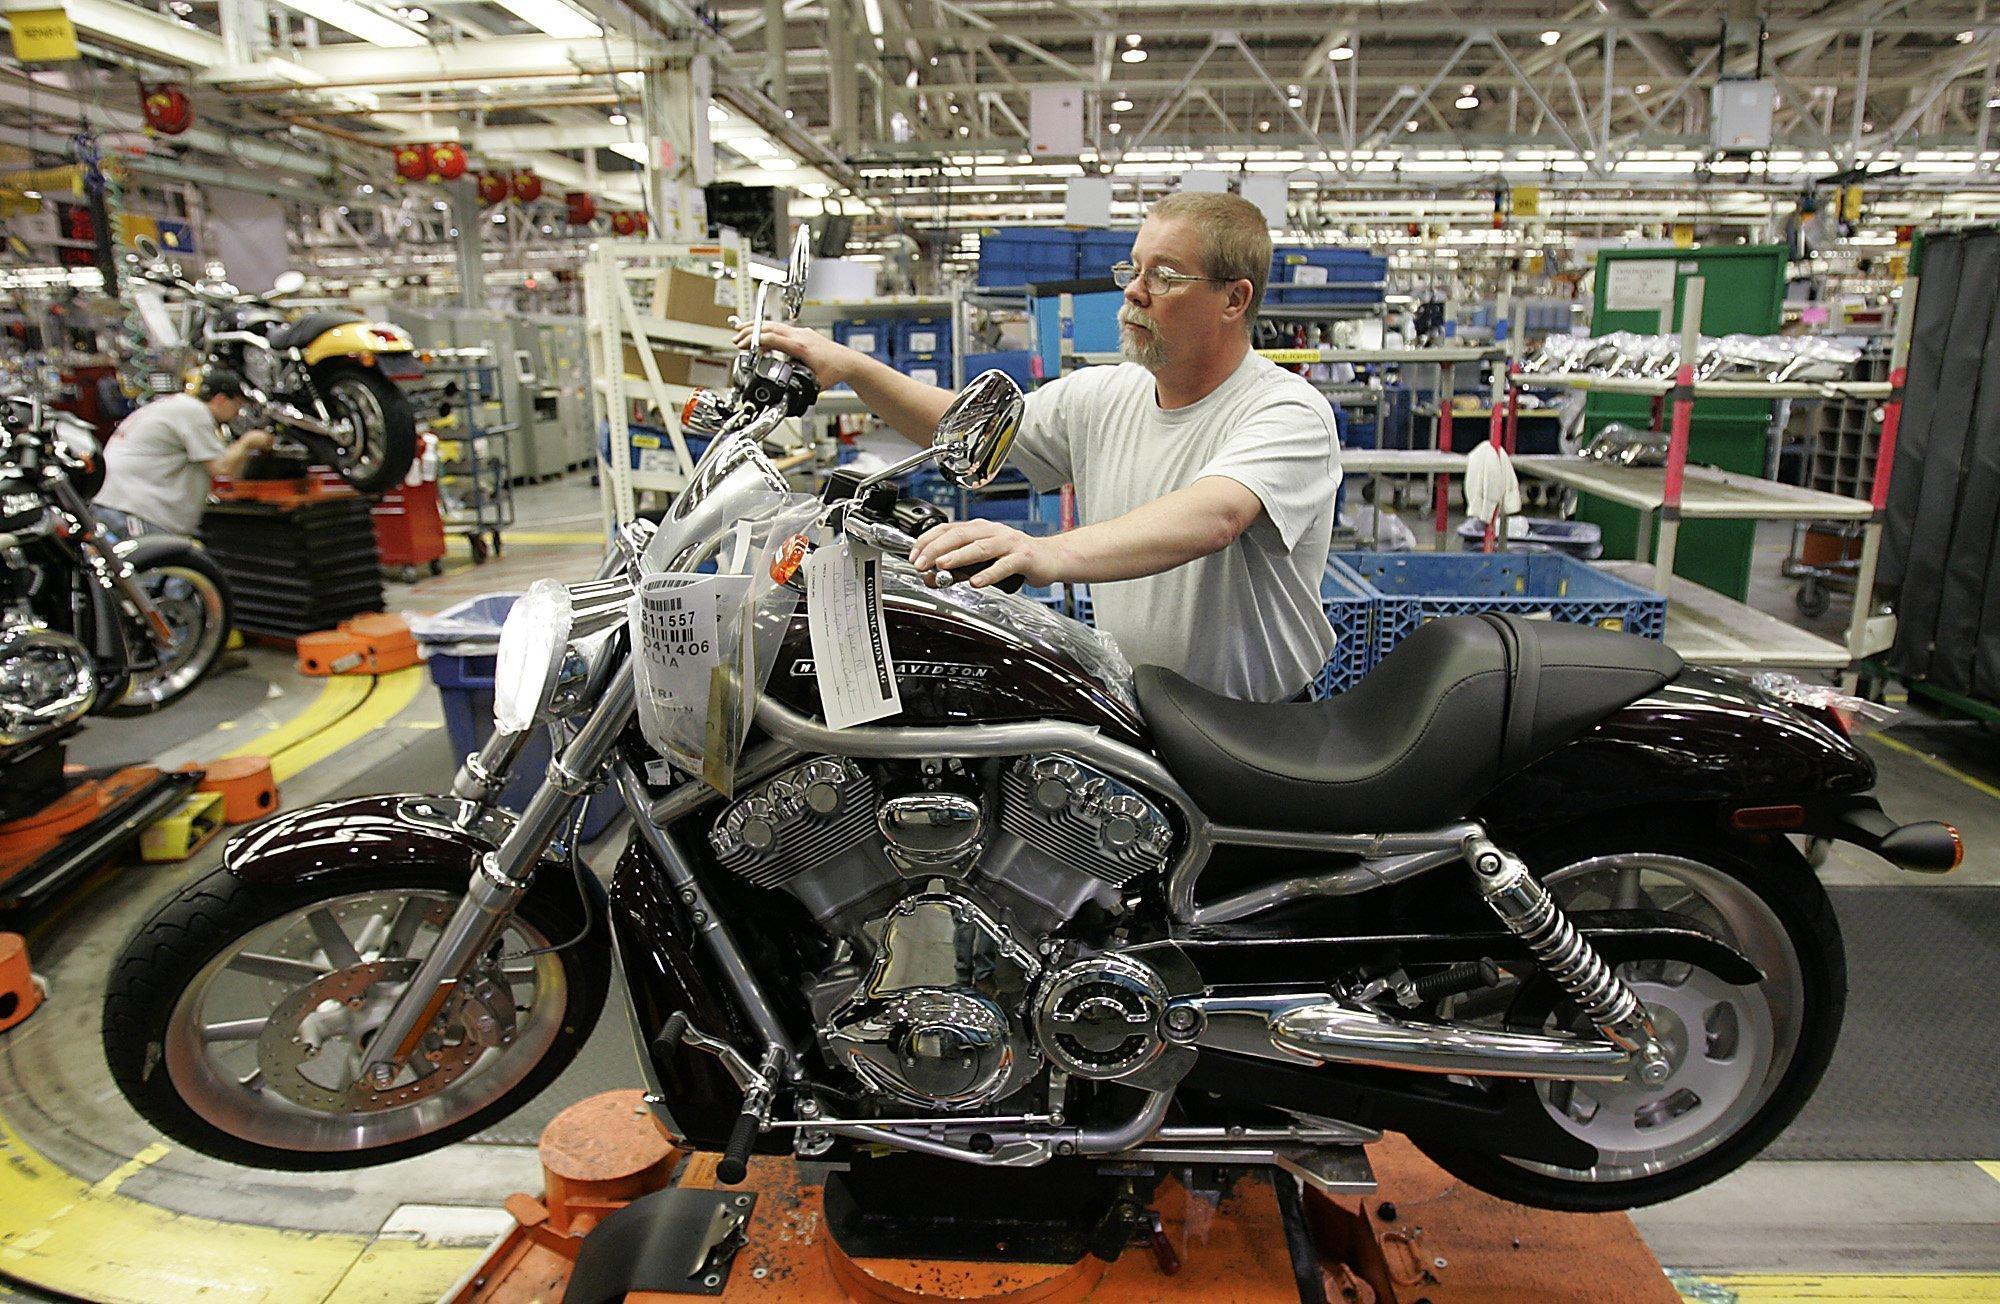 Harley Davidson: Harley-Davidson Shuts Plant As Woes Worsen For Trump's